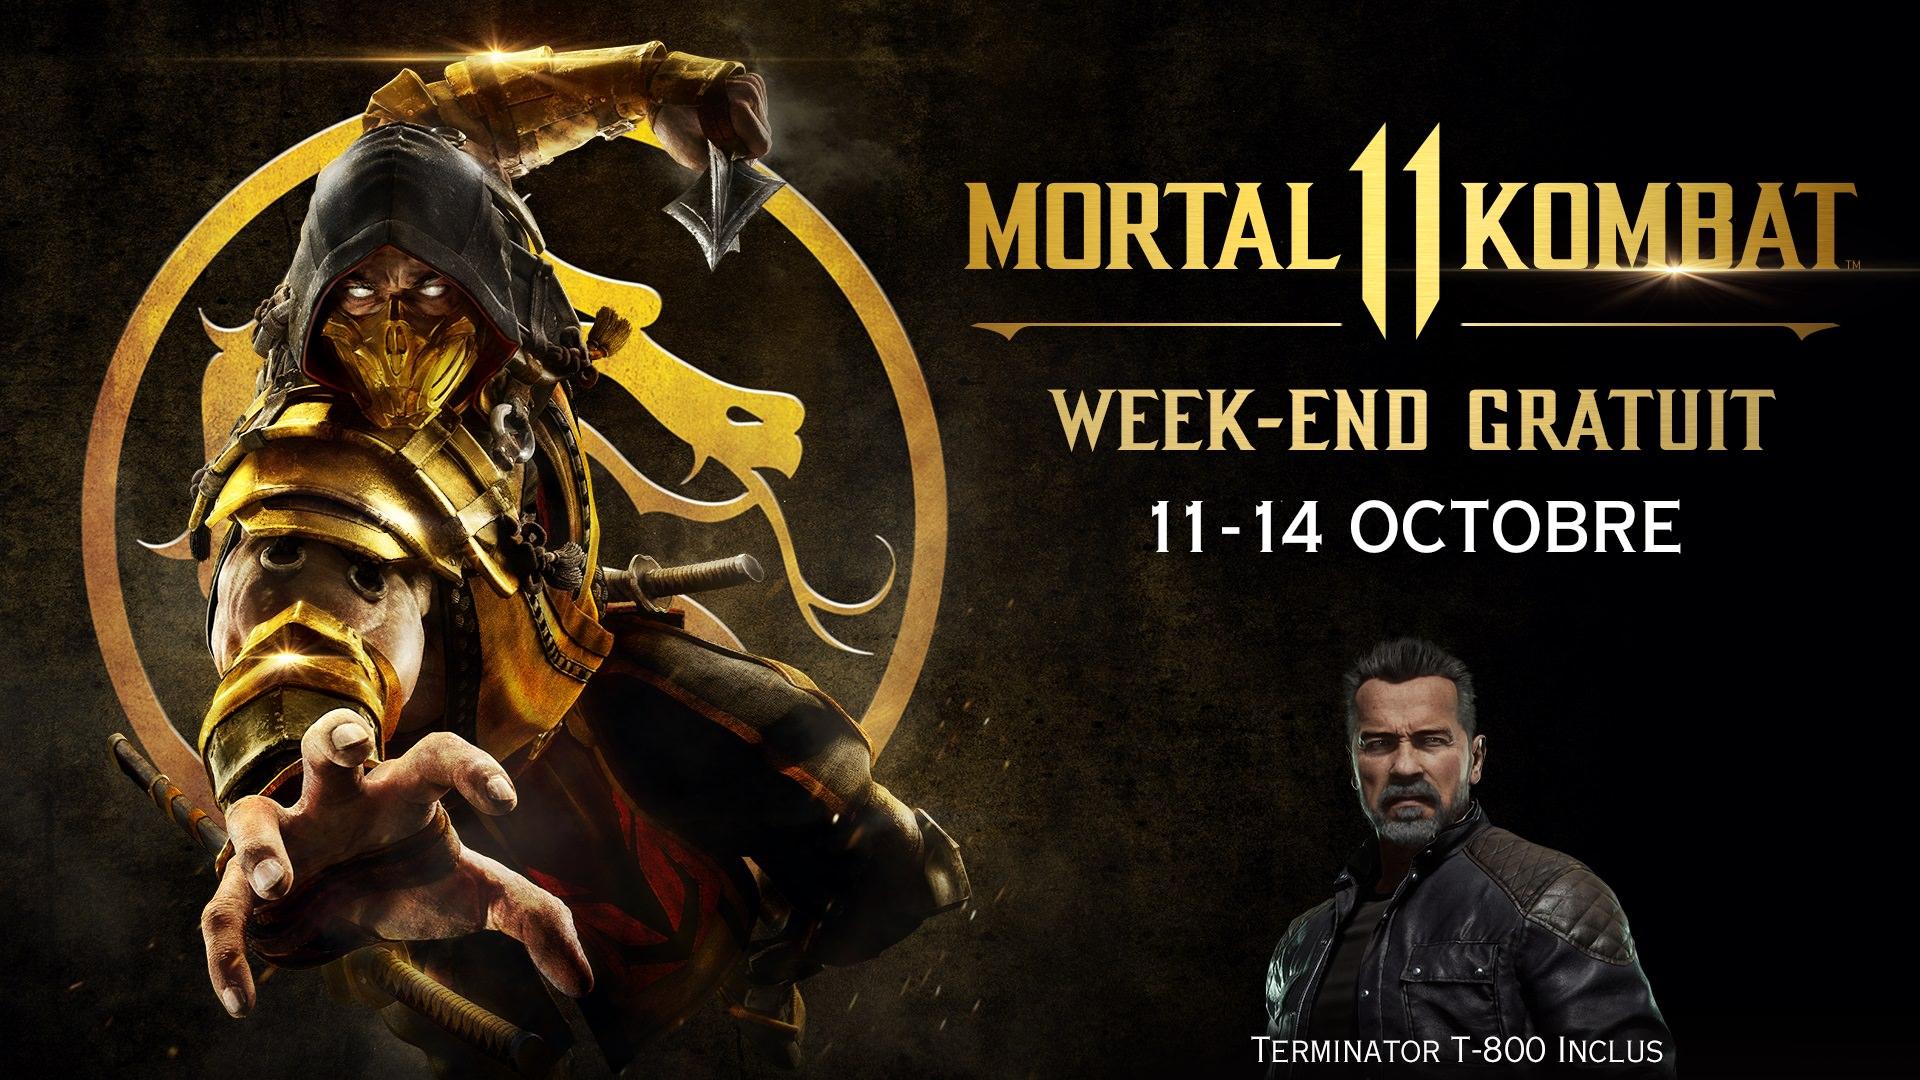 Mortal Kombat 11 sera disponible gratuitement ce week-end